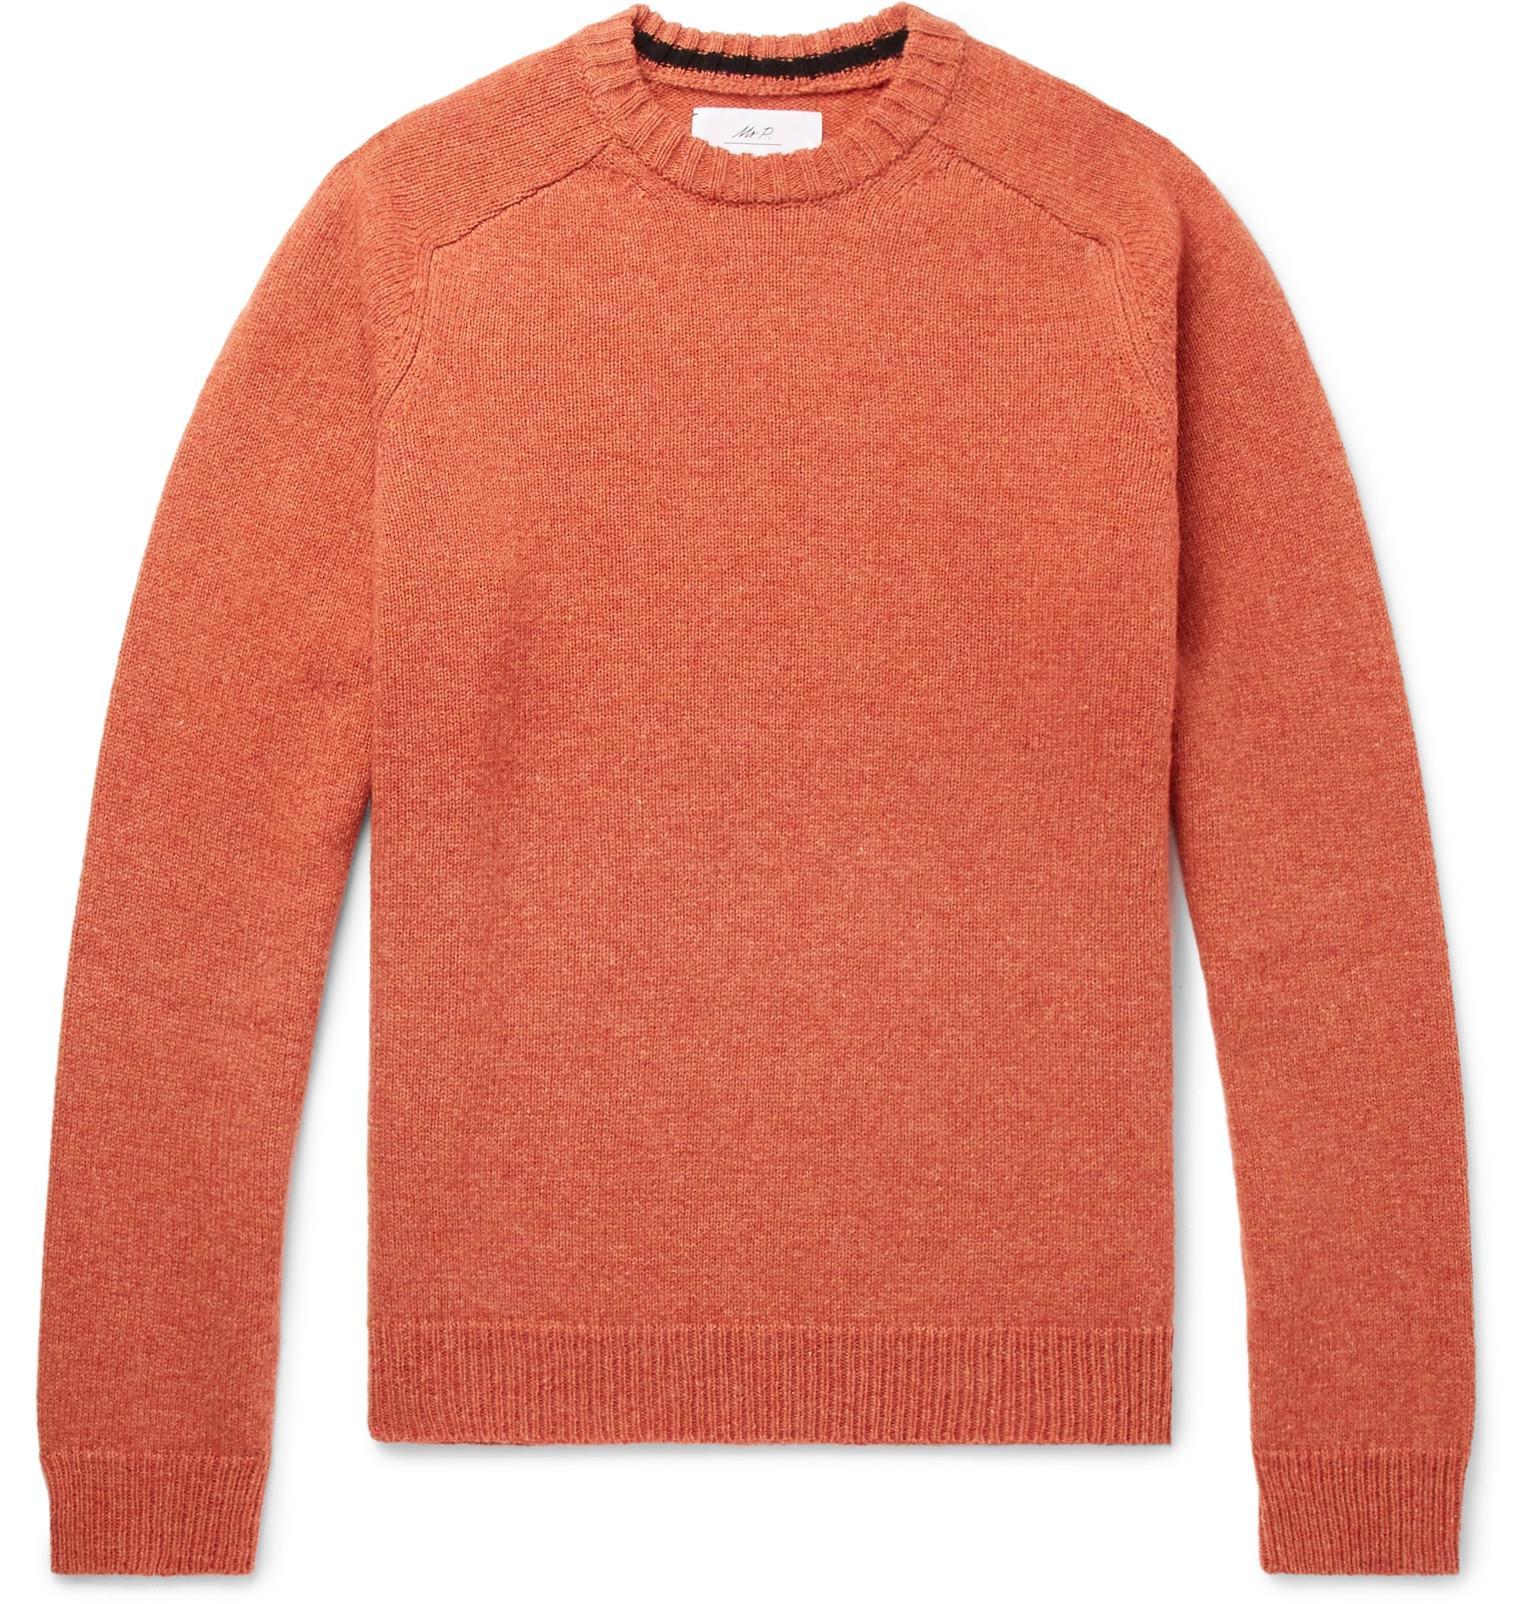 Mr P. Mélange Shetland Wool Sweater - Green kGa1x